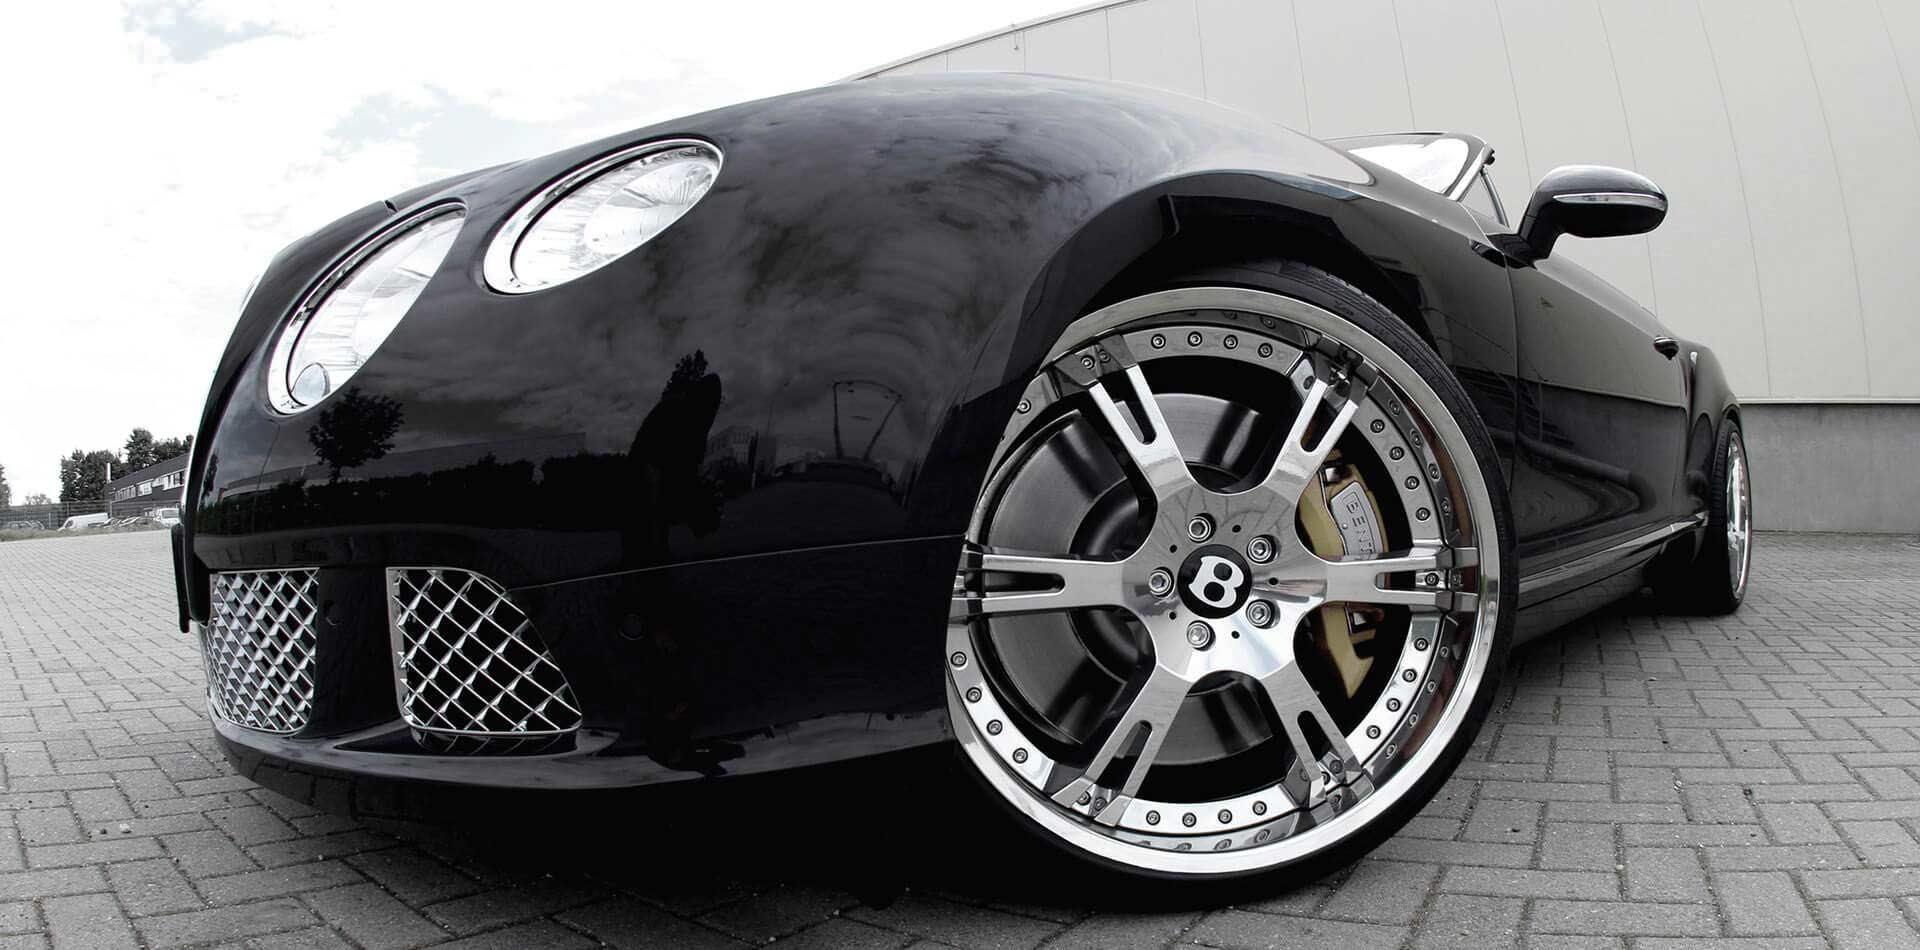 Bentley Continental Felgen 21 und 22 Zoll